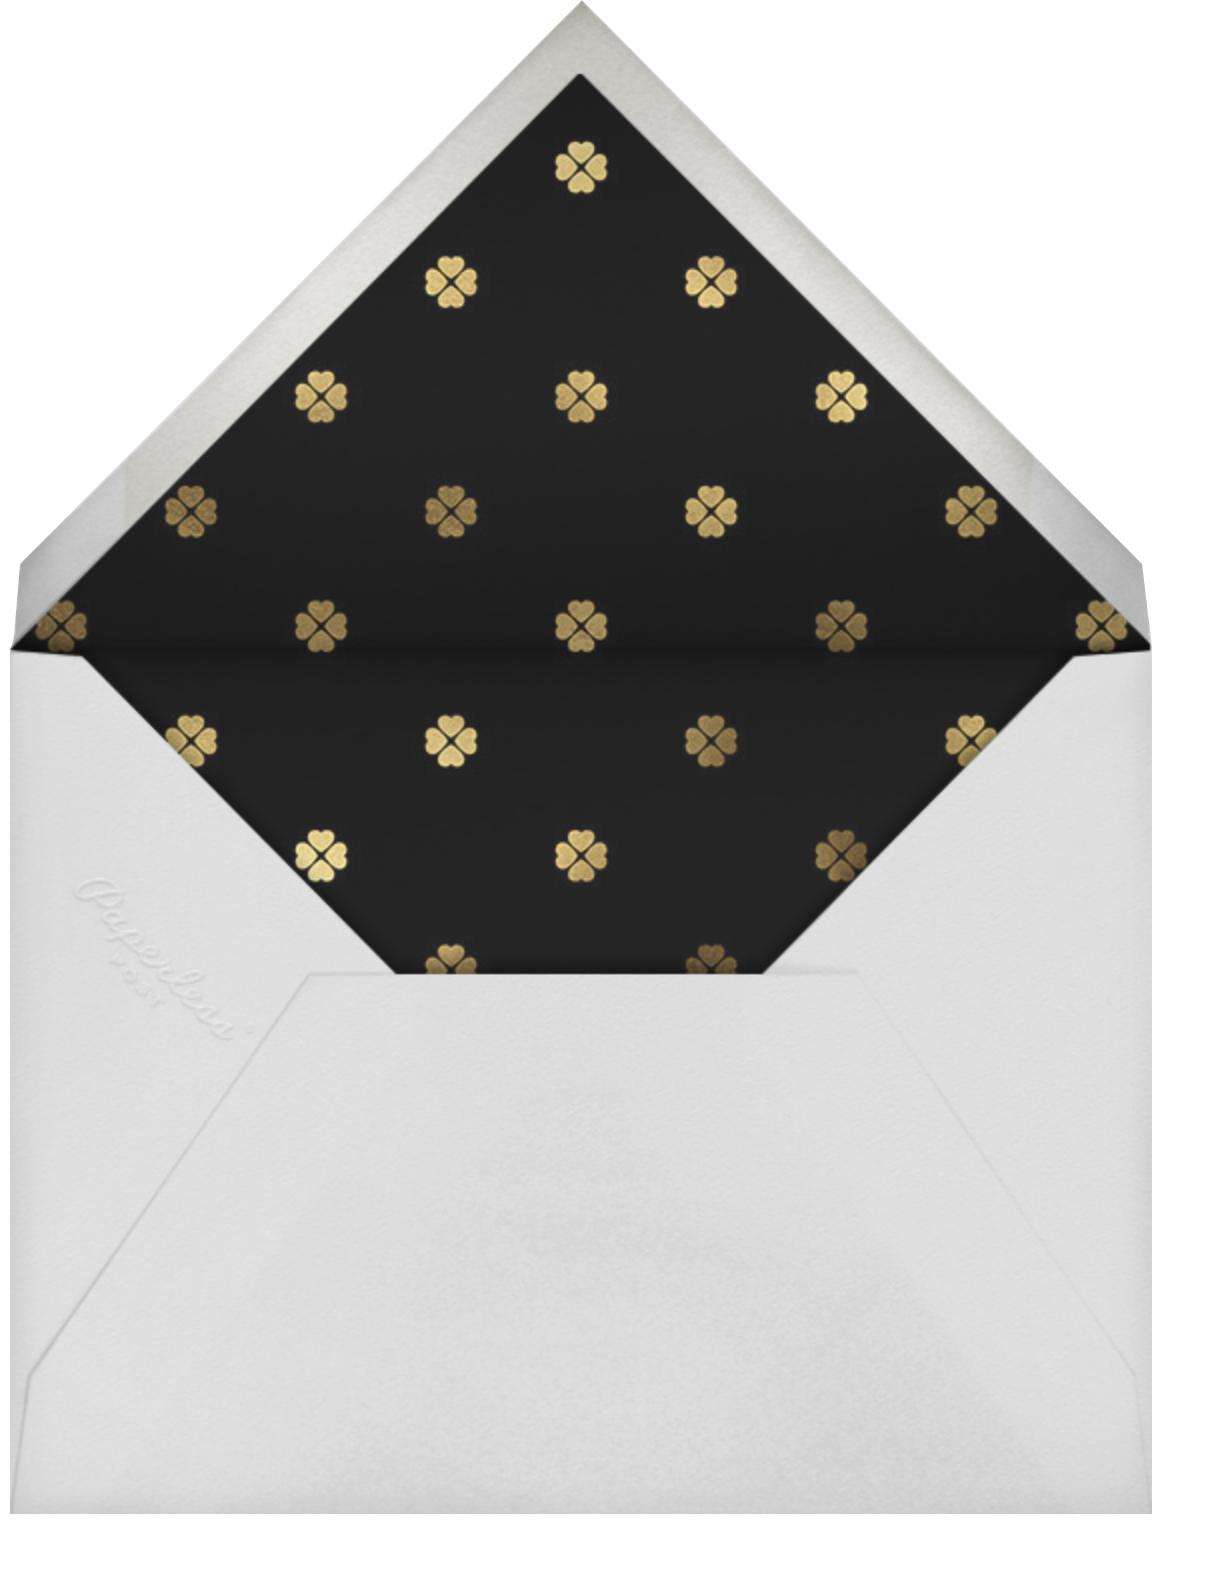 Colorblocked Border - Rose/Black - kate spade new york - Adult birthday - envelope back